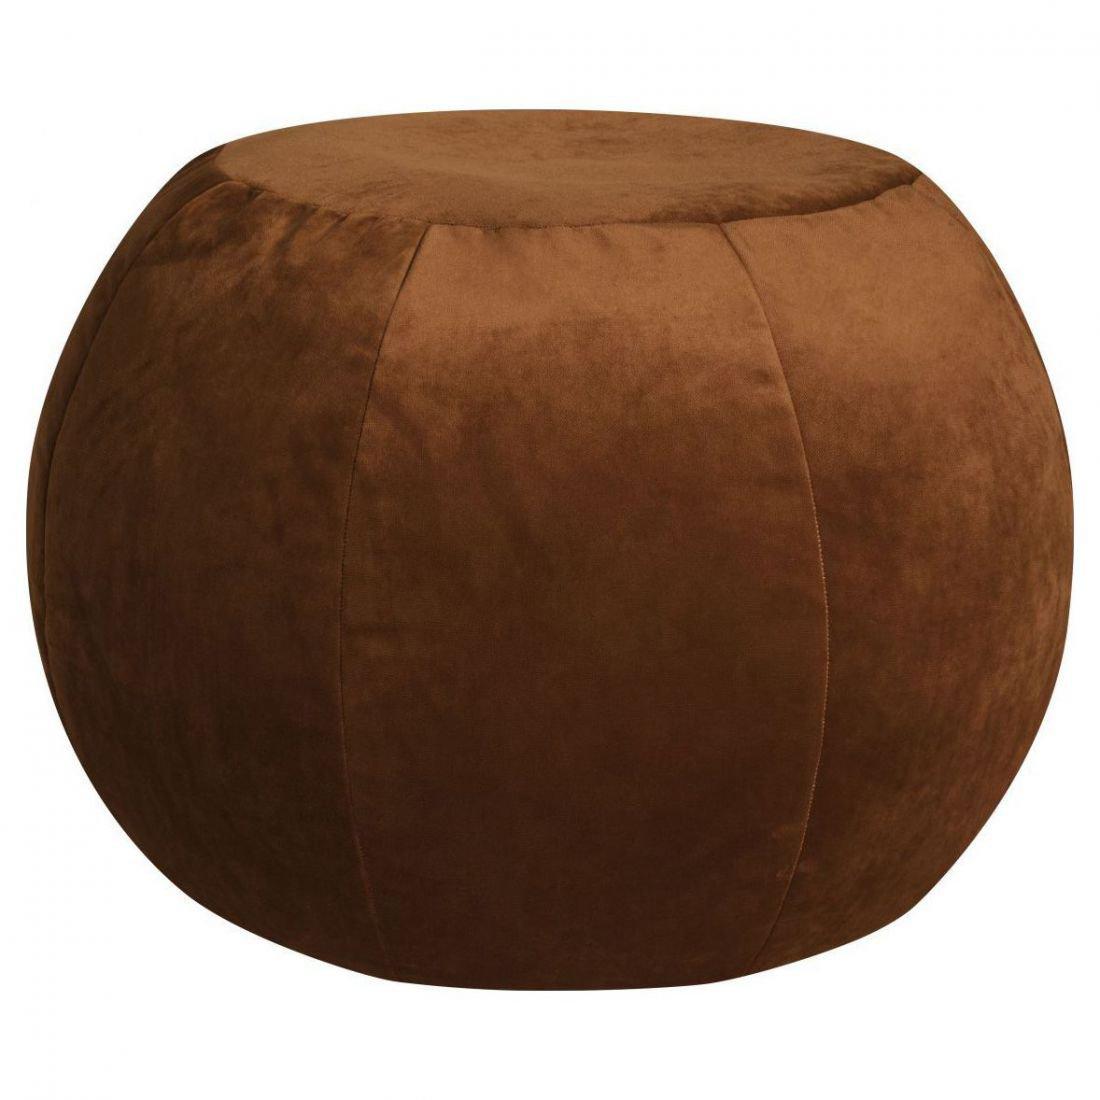 sitting point poef plump veluto koper